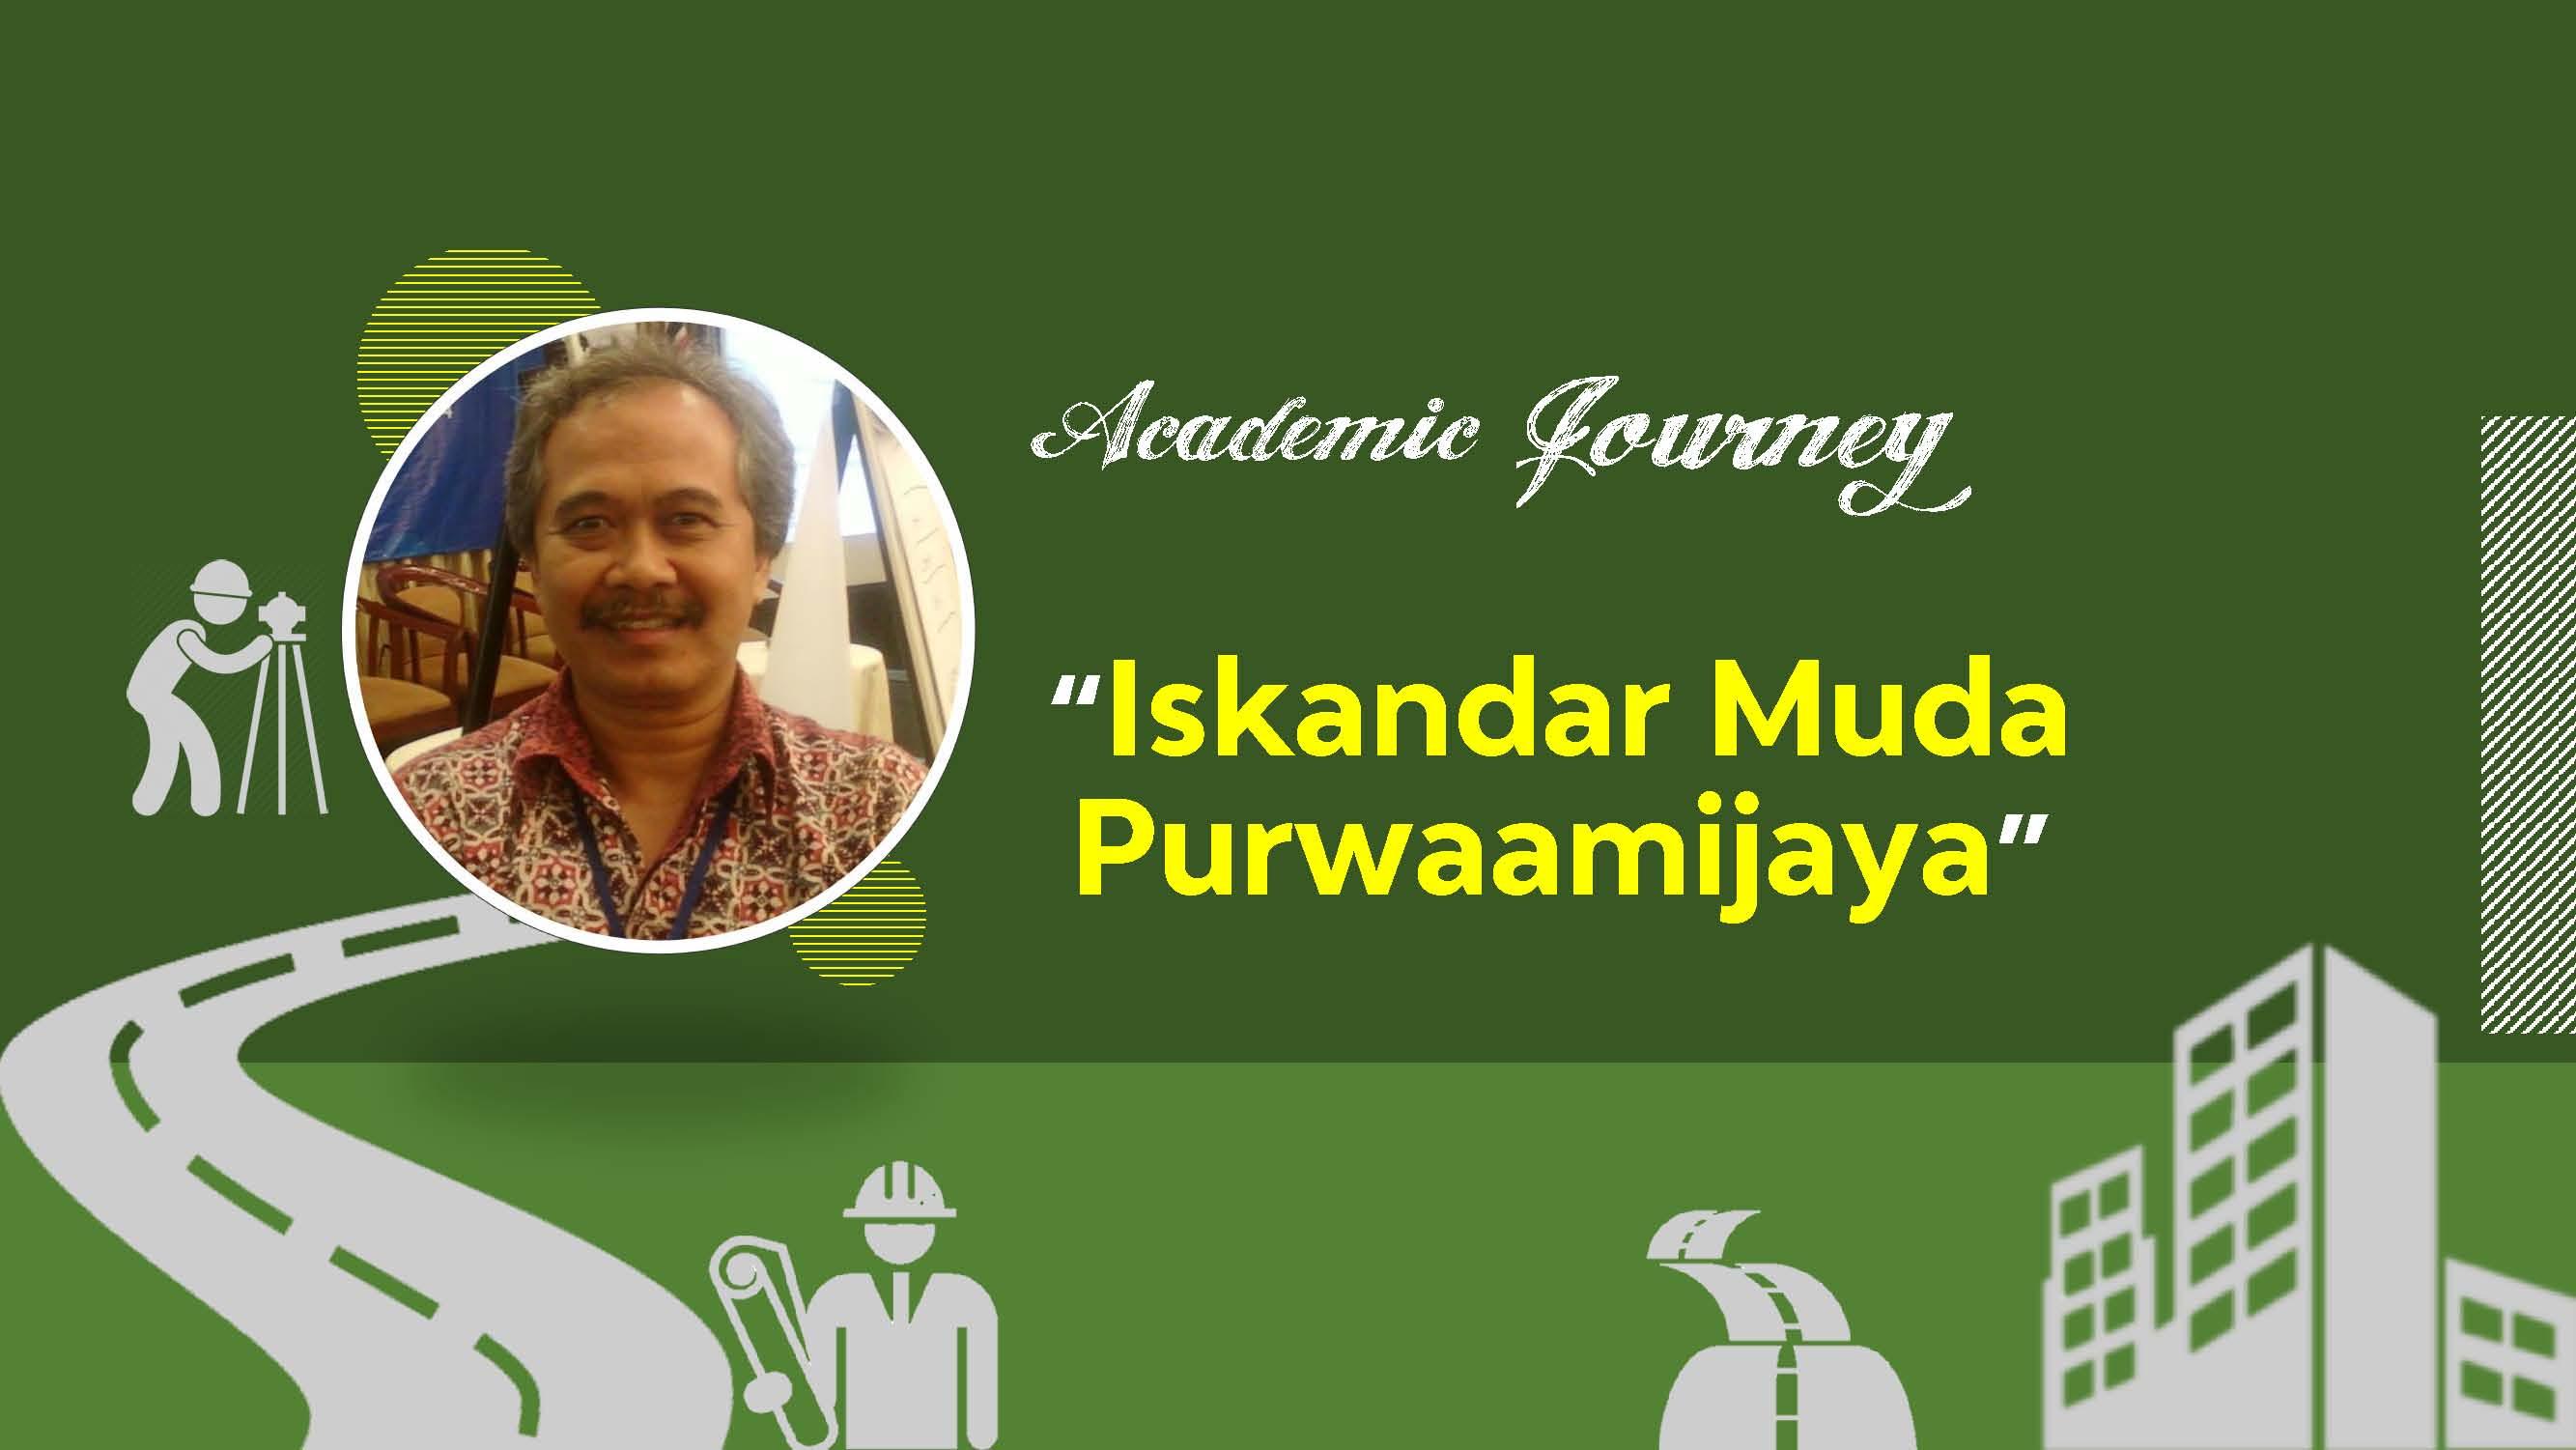 Academic Journey of Dr. Ir. Drs. H. Iskandar Muda